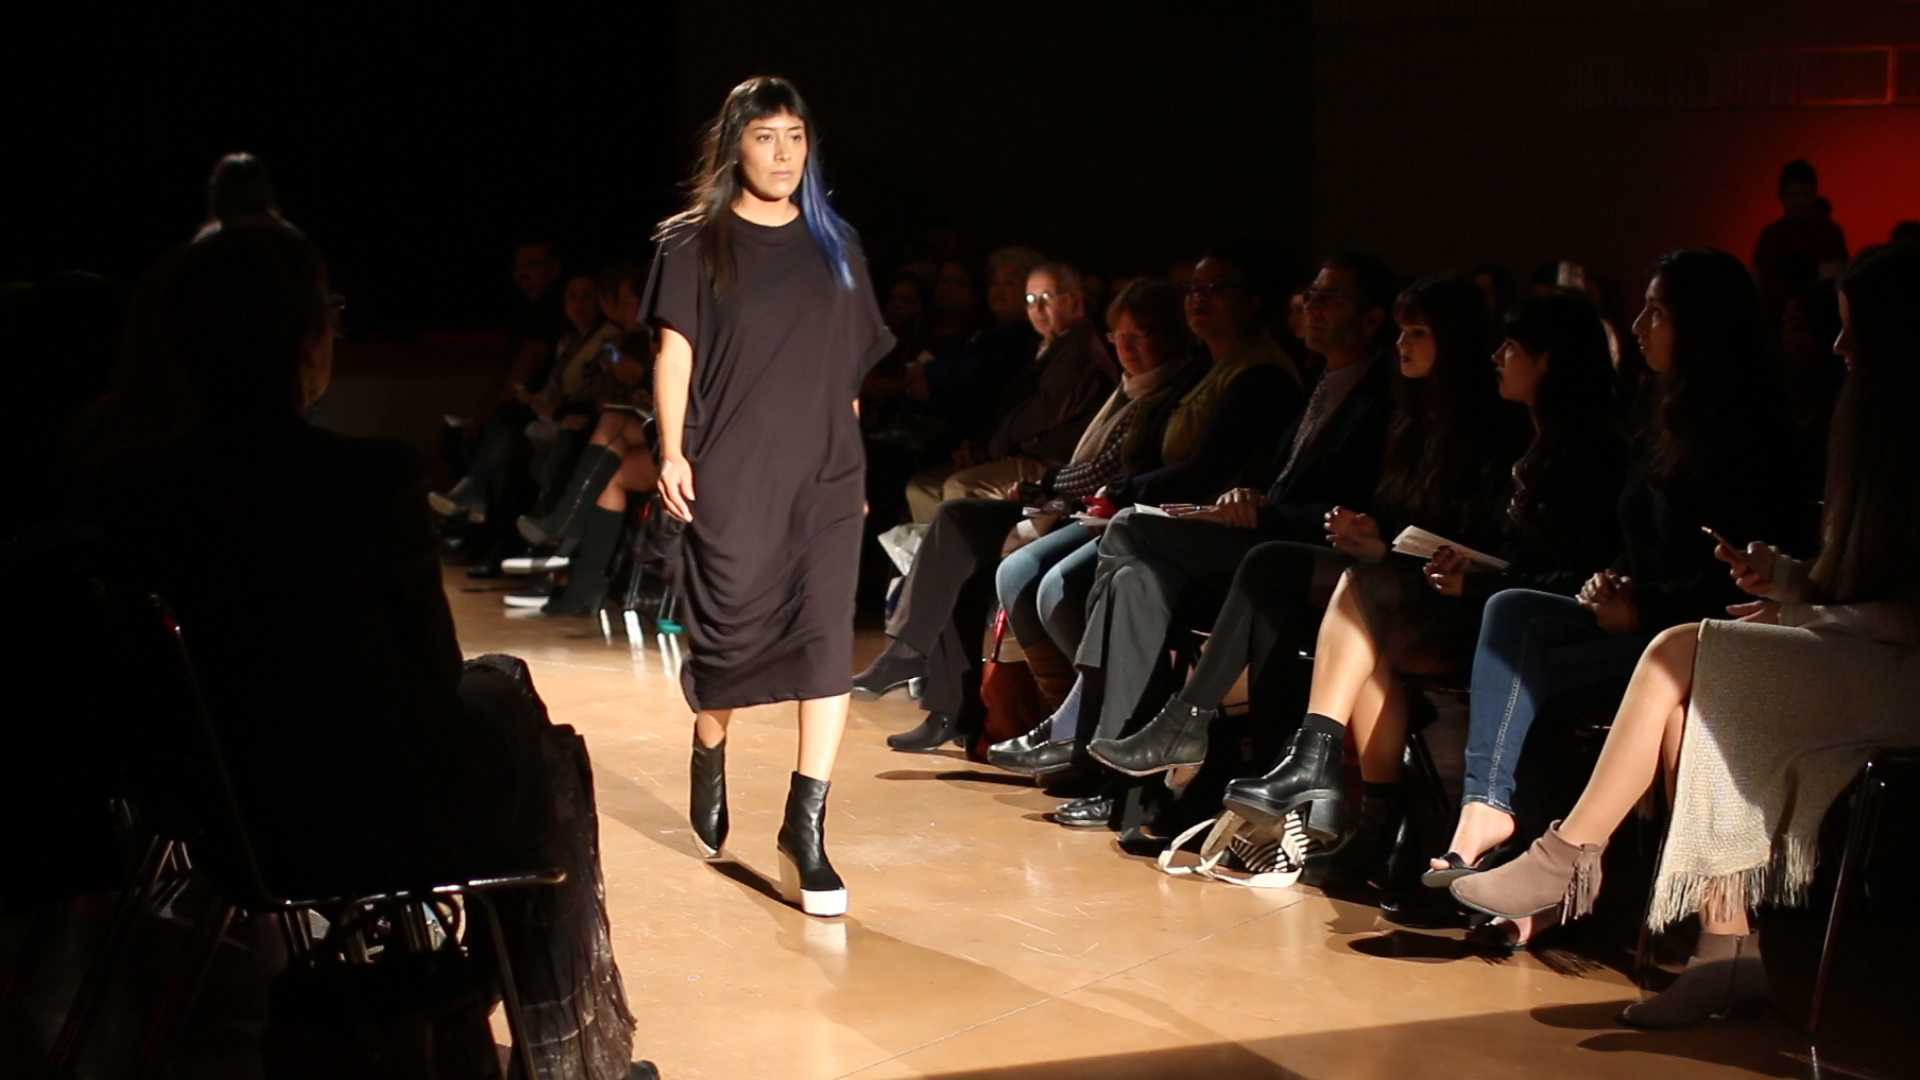 SF State fashion designer major Lia Herrera walks down the runway at the annual fashion show themed